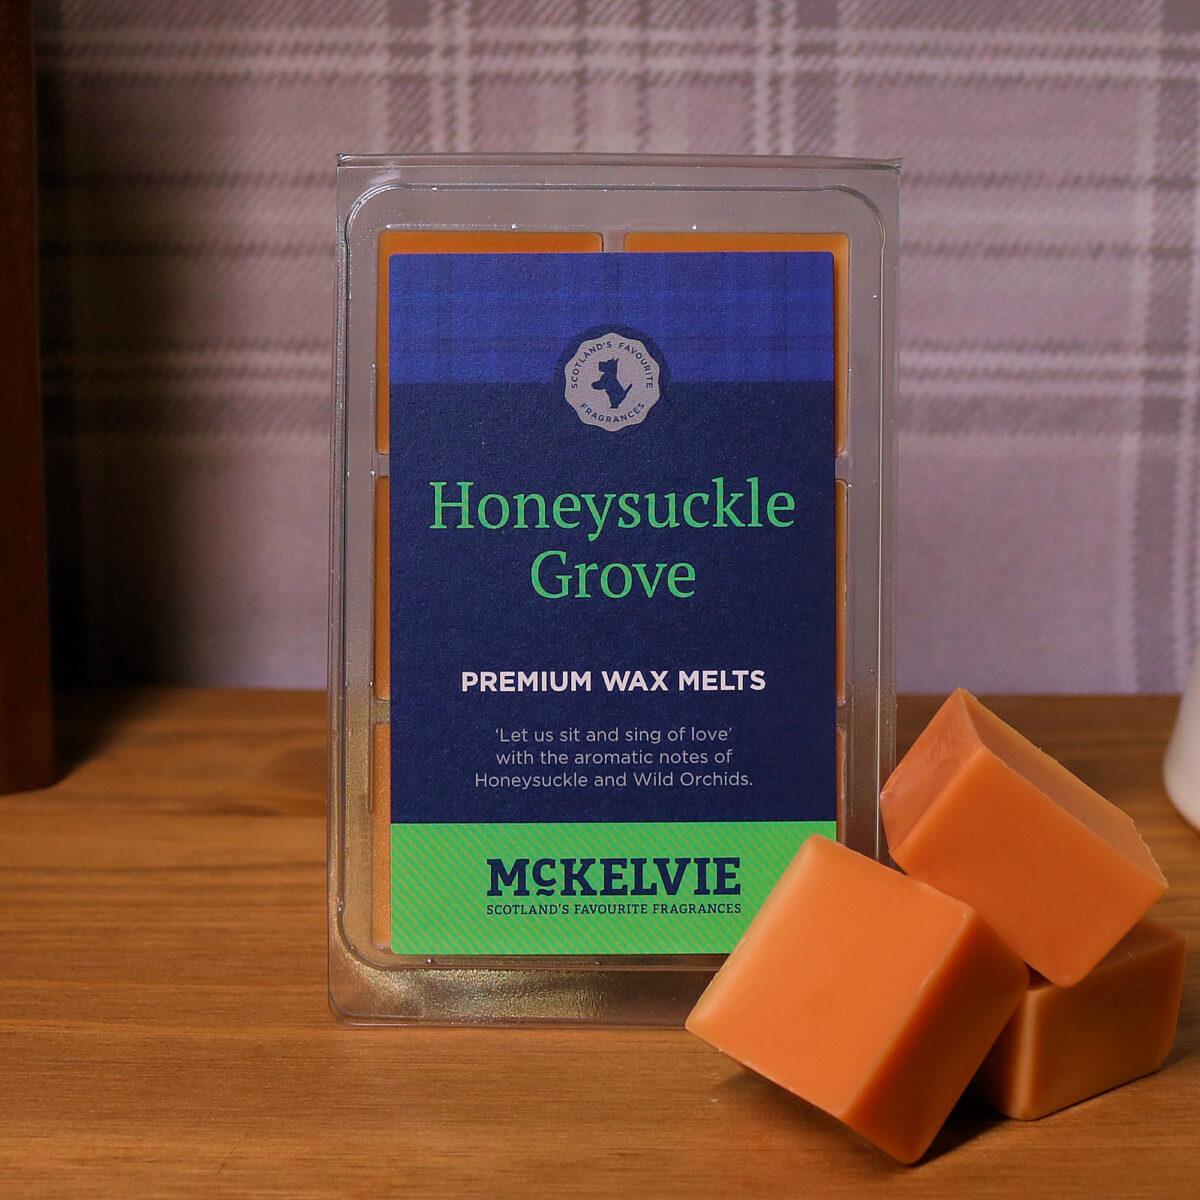 Honeysuckle Grove Wax Melts